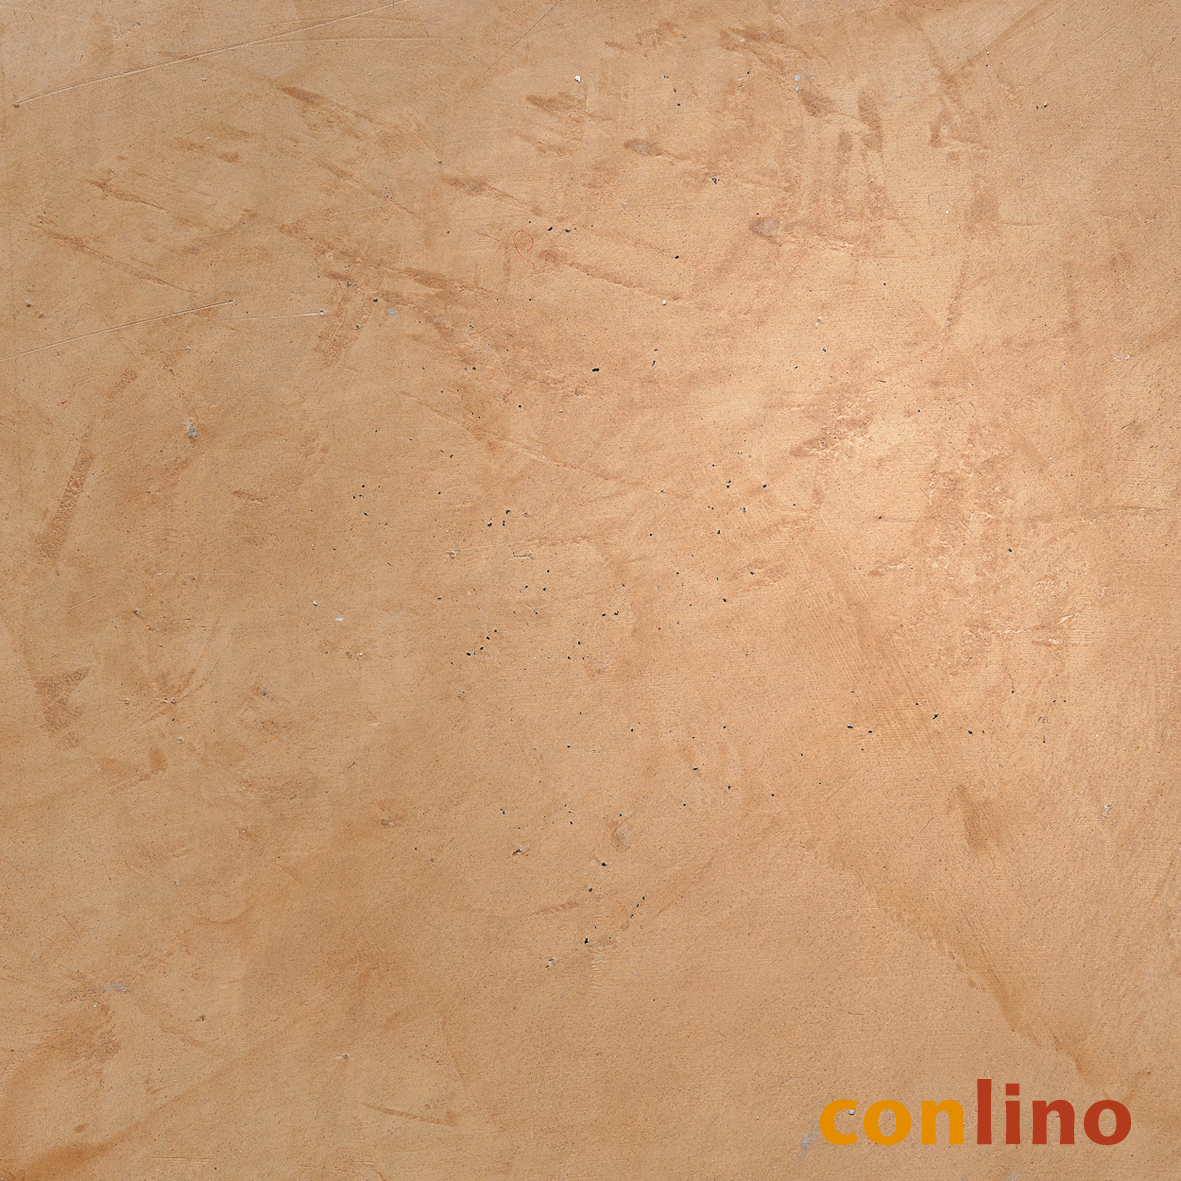 conluto Lehm-Glätte Barro Tinaja CG 113